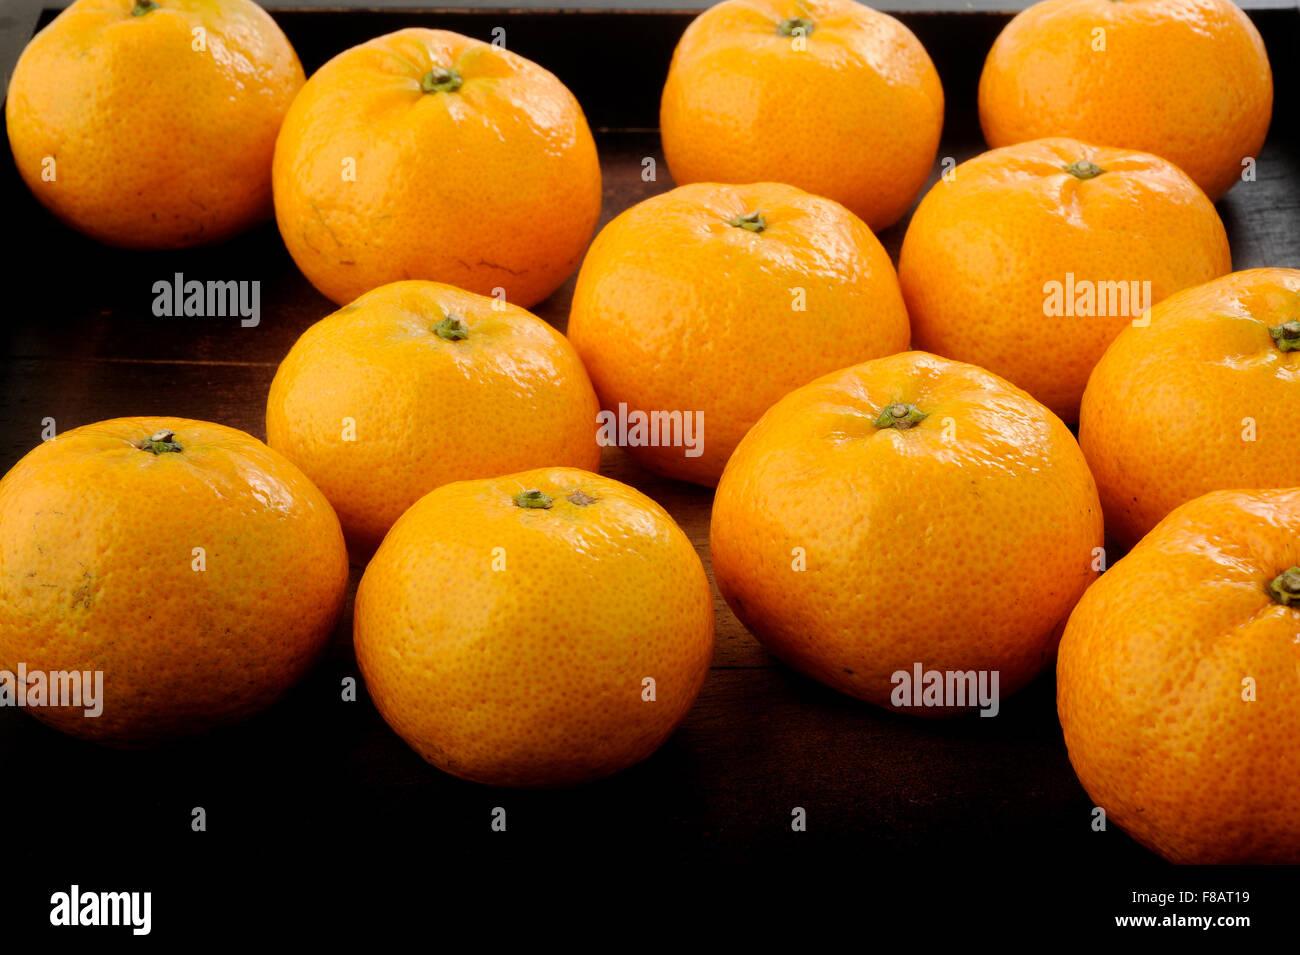 Mandarin orange in wooden tray - Stock Image